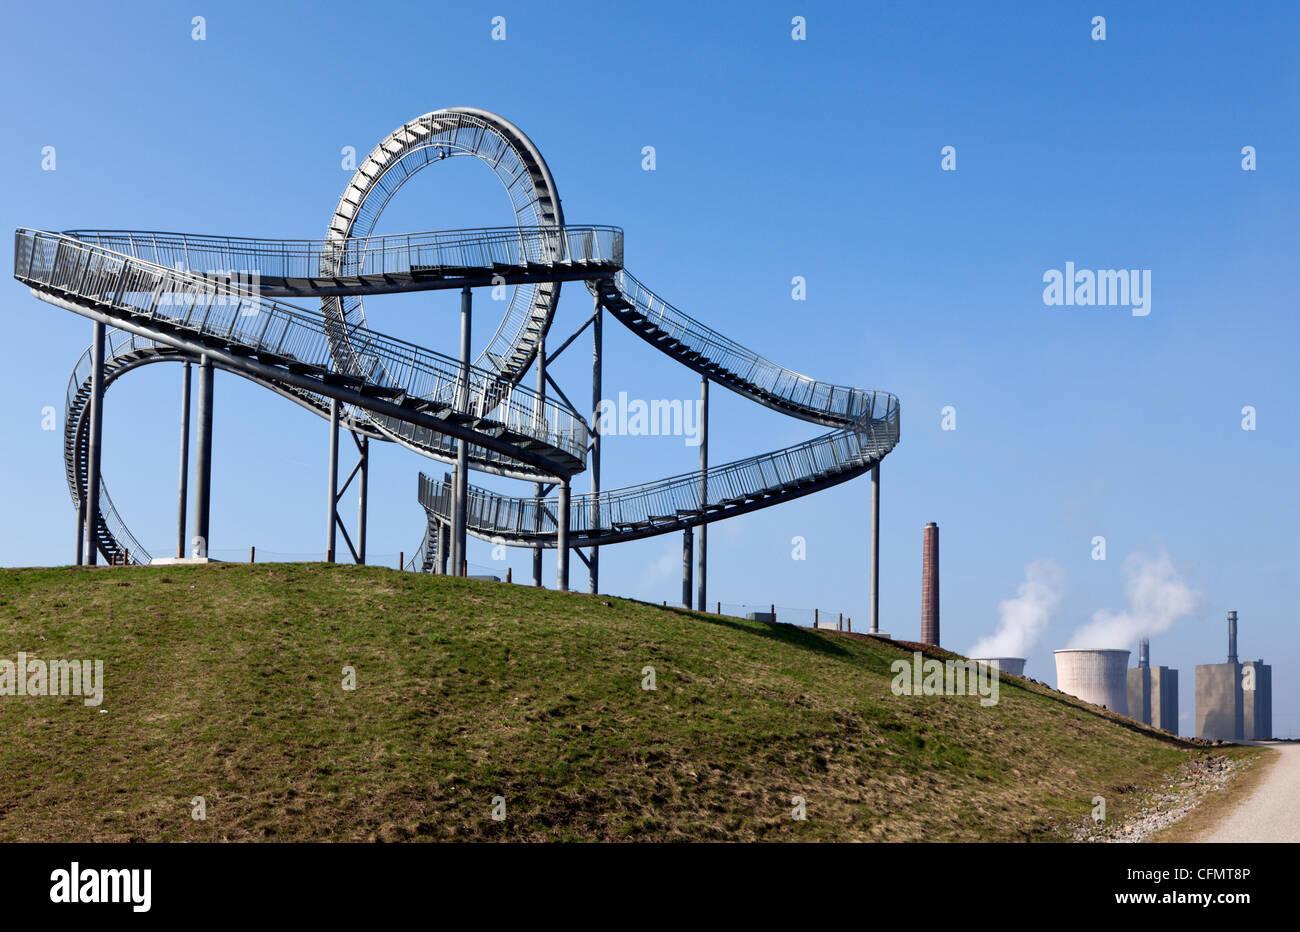 Tiger & Turtle, pedestrian rollercoaster, Duisburg-Wanheim, Germany - Stock Image